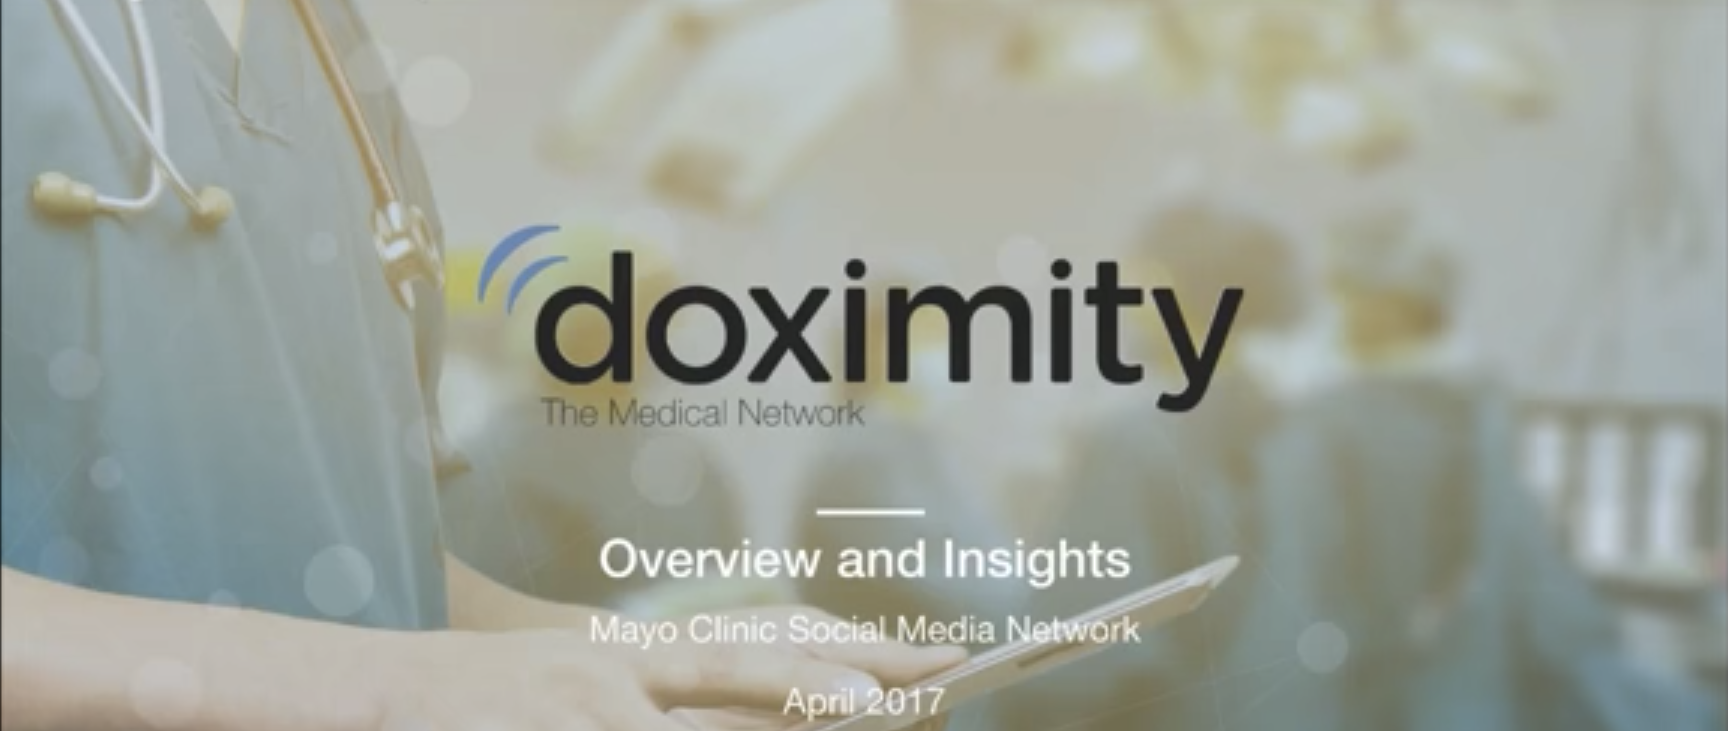 Inside Doximity